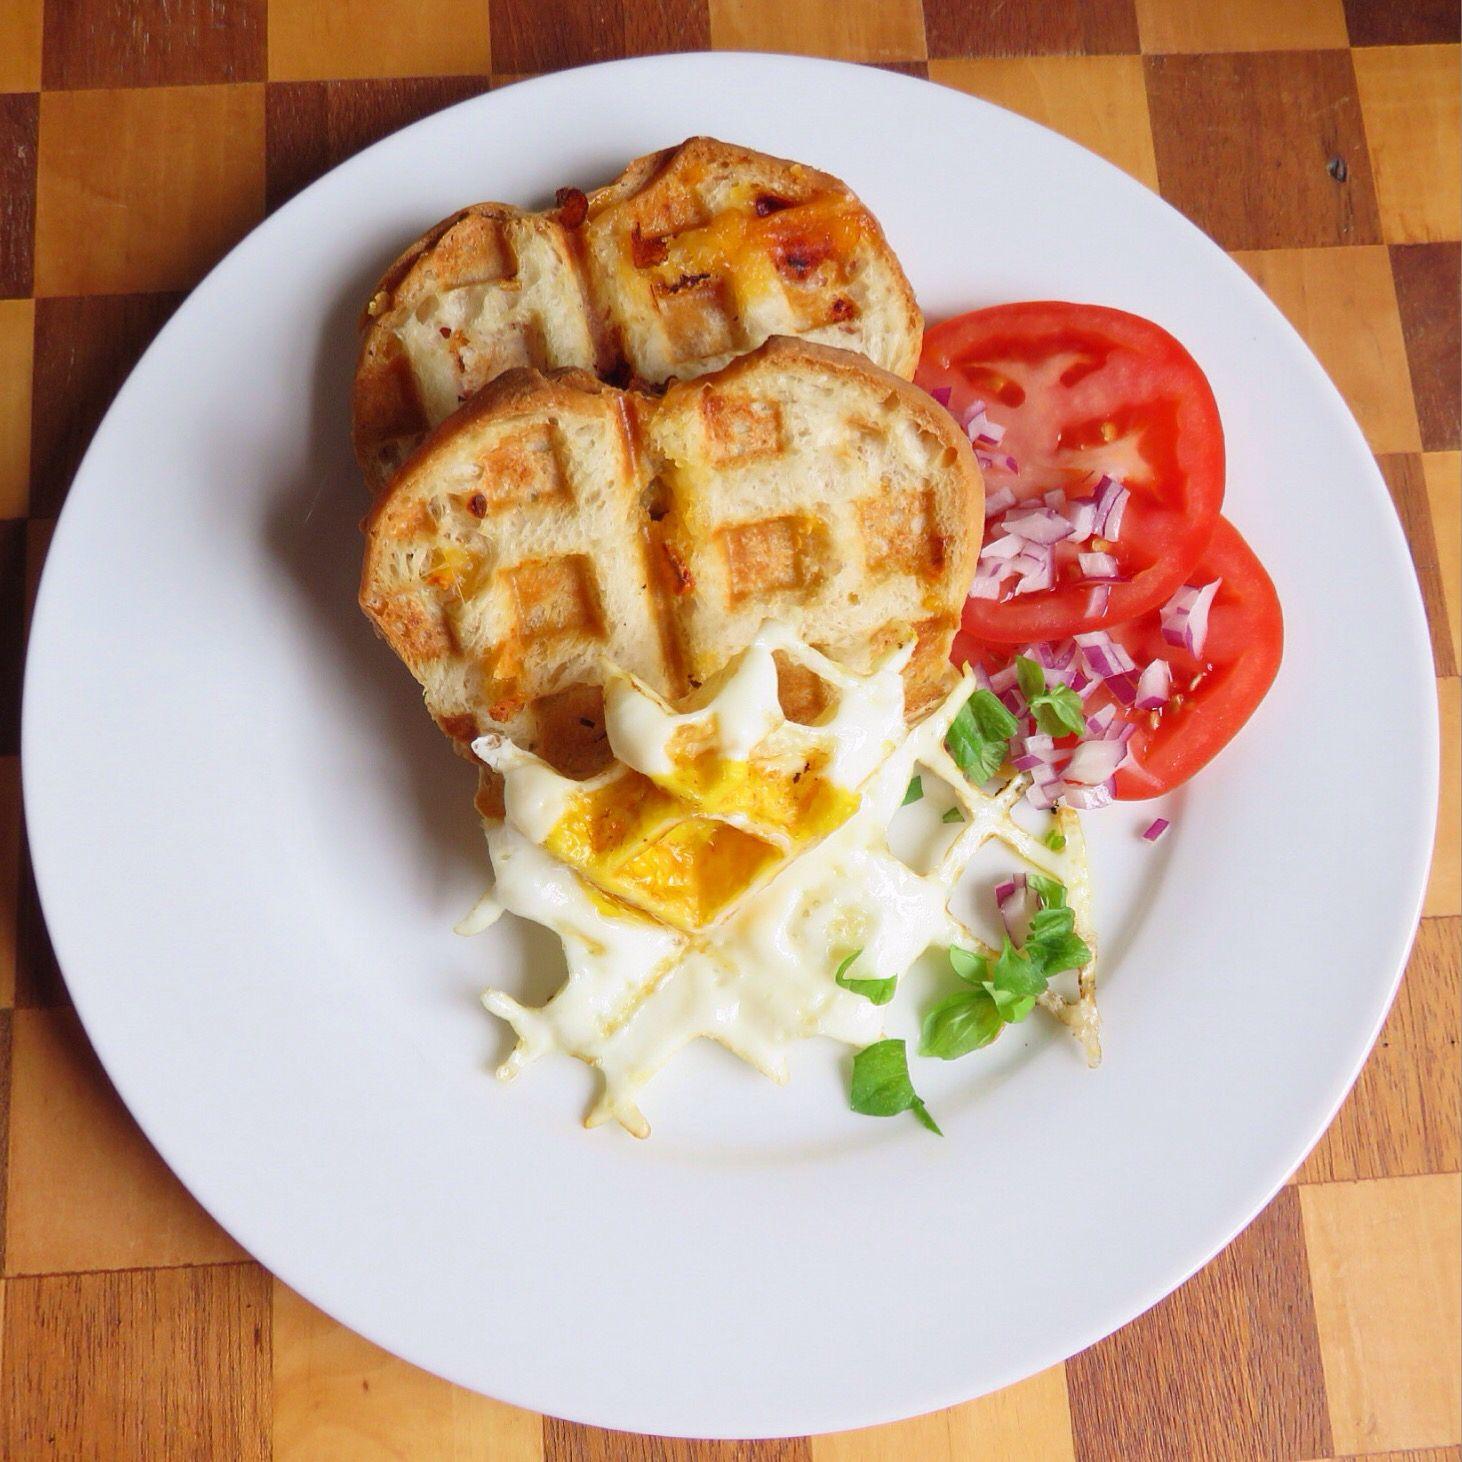 "2/8/16 grilled Italian cheese sandwich.  실험작;) 구운 치즈 샌드위치. *빵사이에 체다치즈, 몬저넬라치즈, 토마토, 붉은양파, 바질, 오리가노, 페페론치노넣어 오리브오일 겉에다 살짝발라 와폴기계에다 눌러 주세용~  계란을 너무 익혔다 그러나 재미있는 모양, 된장>.<"" 다음에 다시 도전."